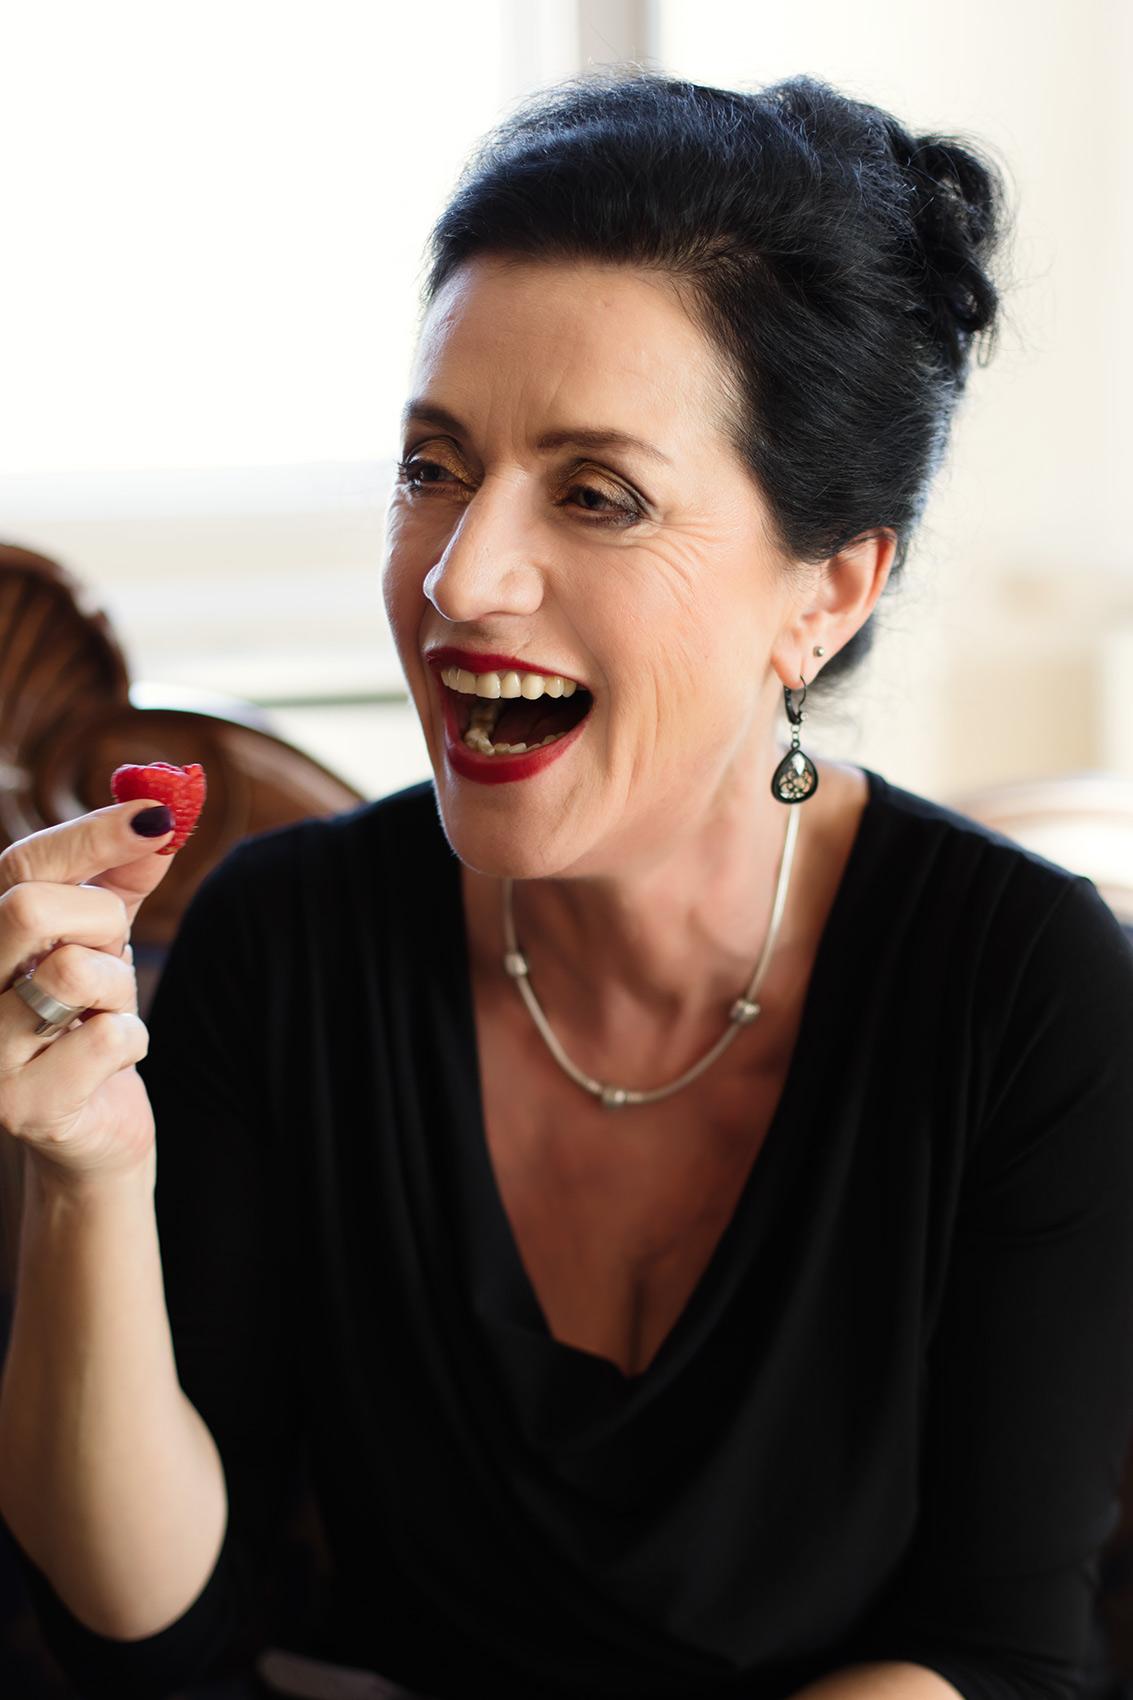 Linda-Scholz-Fotografie-Erlebnis-Fotoshooting-Erfahrung-Spaß.jpg